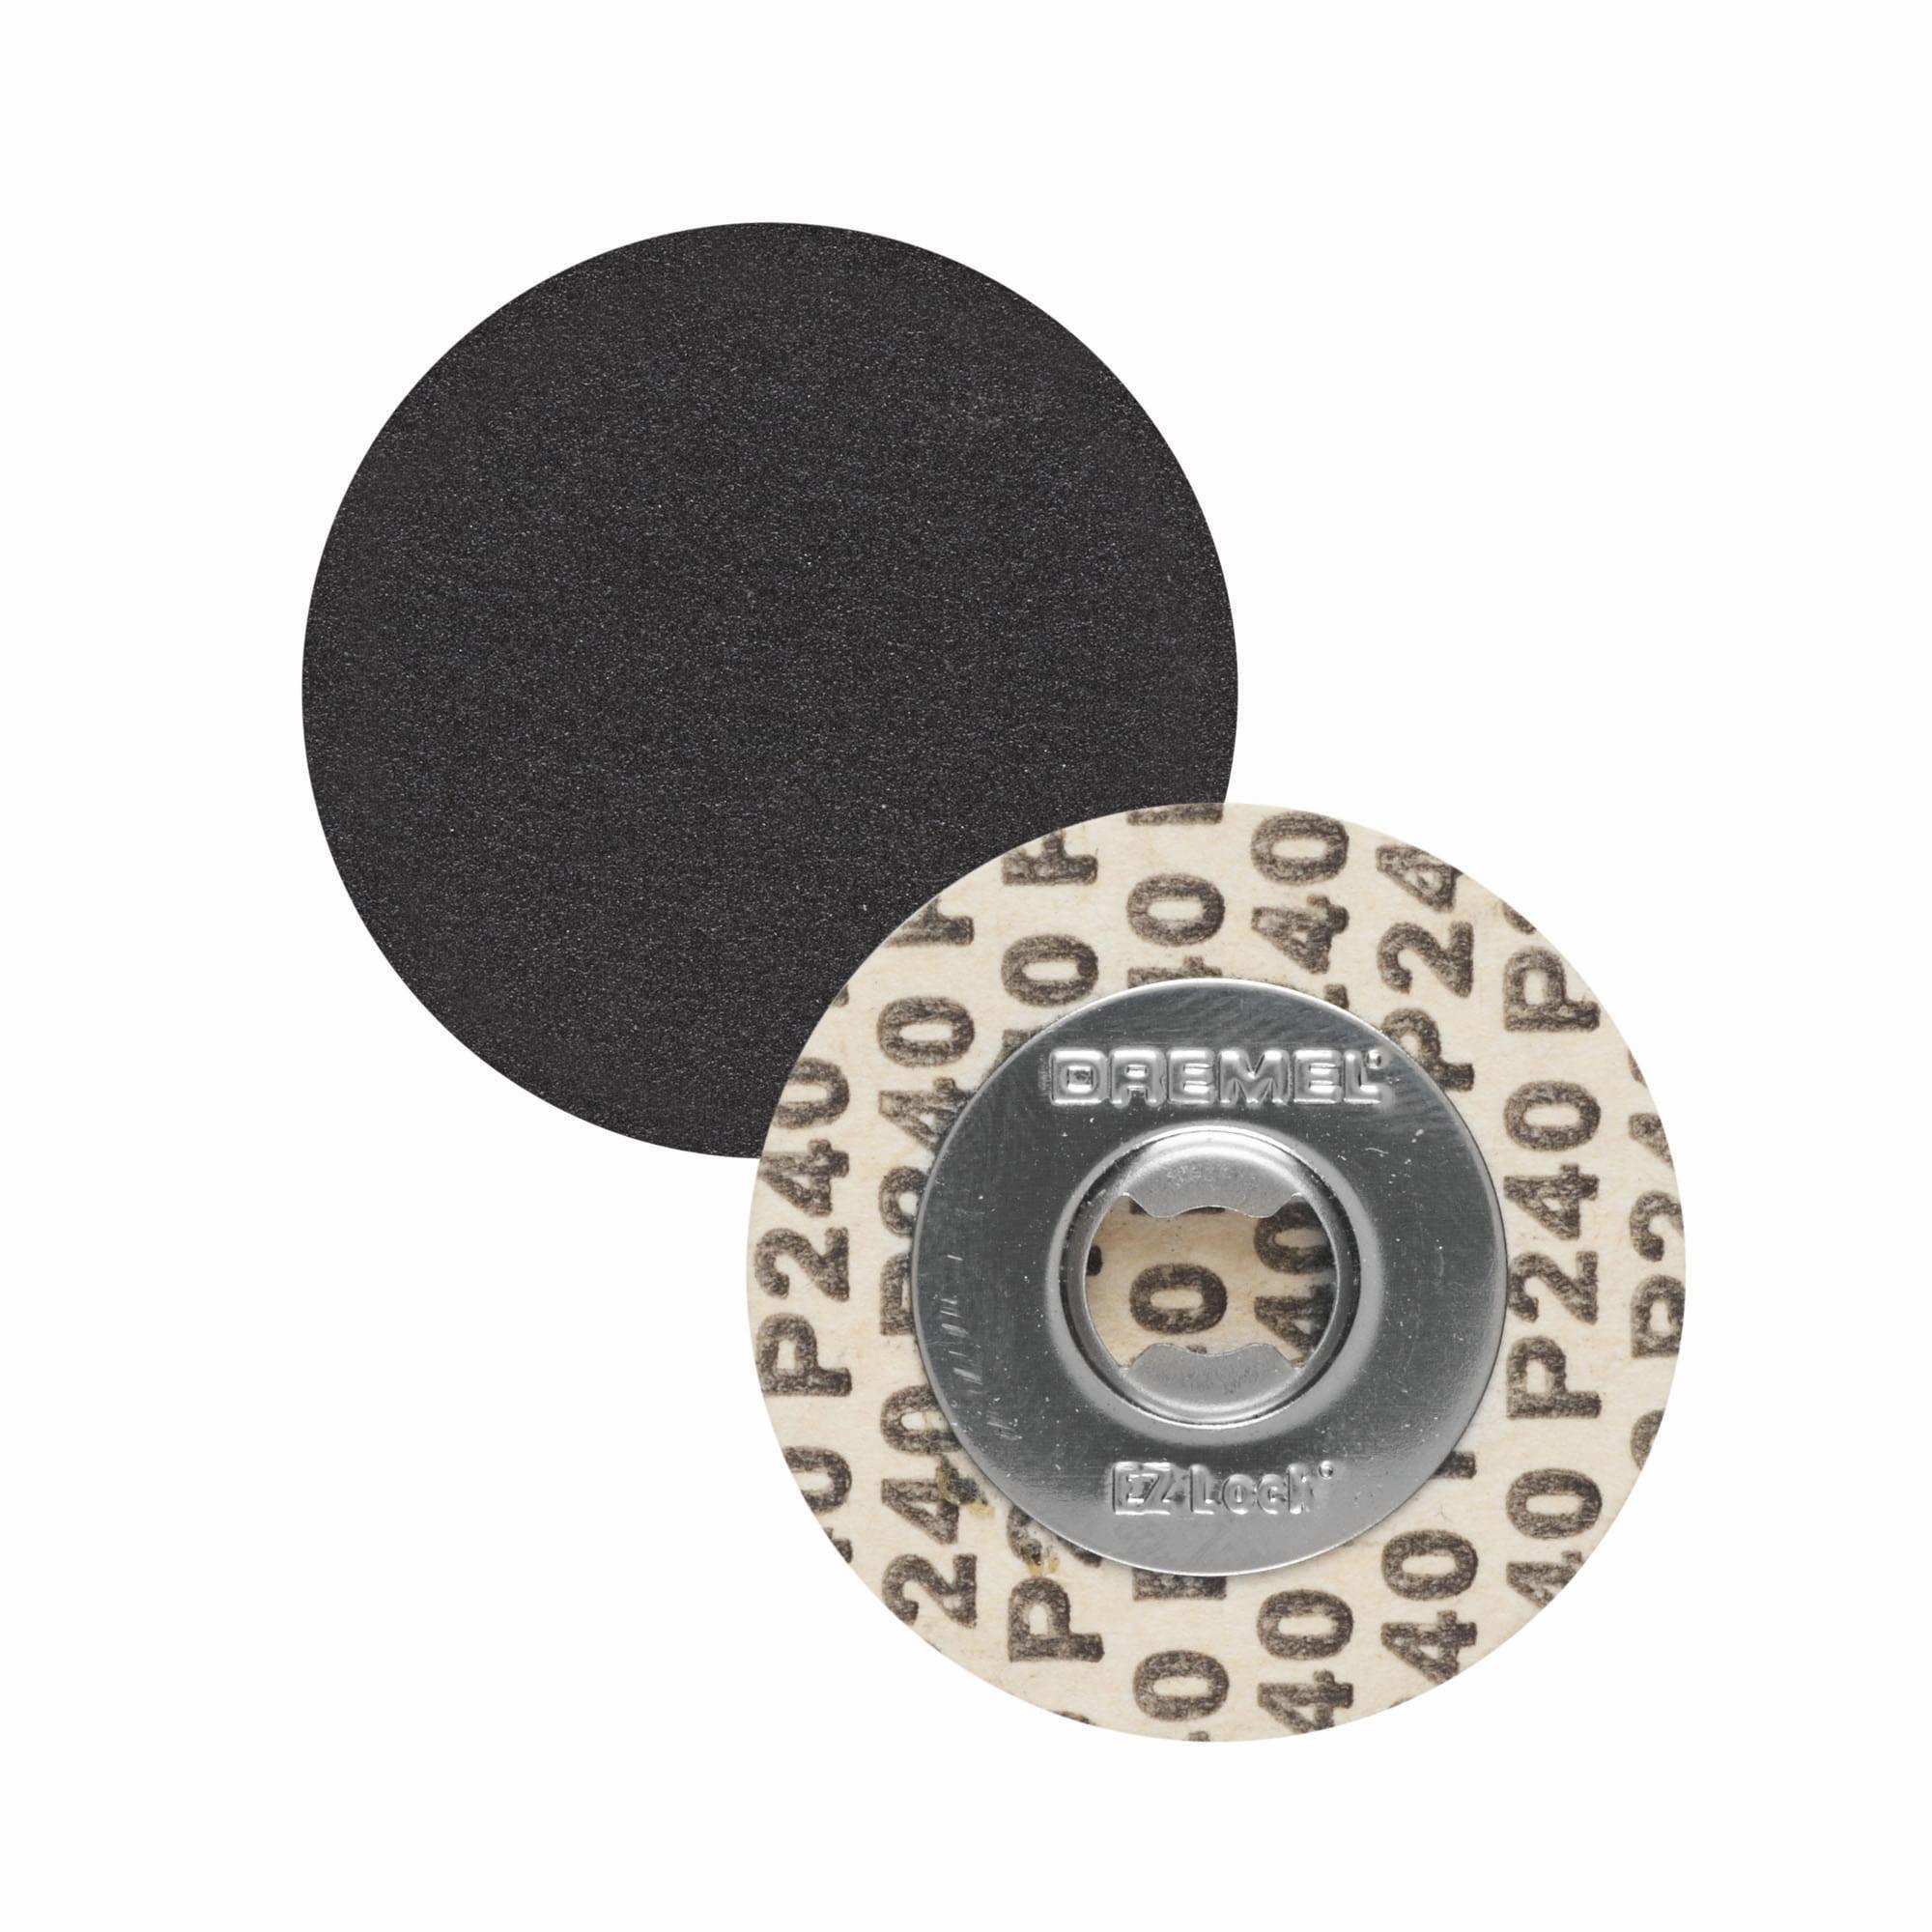 Dremel Ez413sa Ez Lock 1 1 4 Inch 240 Grit Sanding Discs 5 Pack Walmart Com